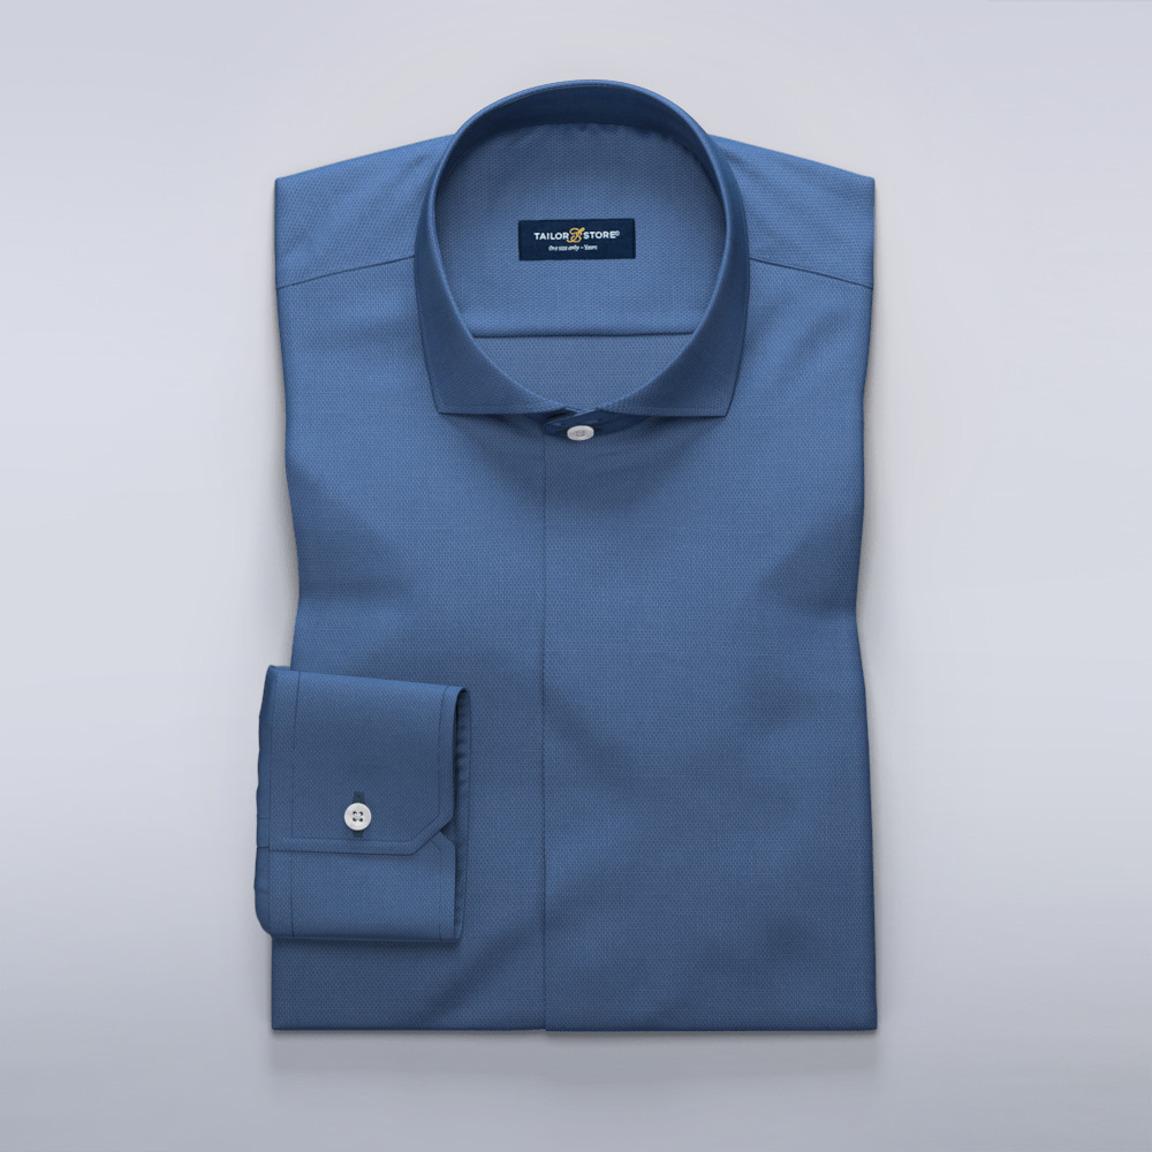 Medium blå, mønstret skjorte